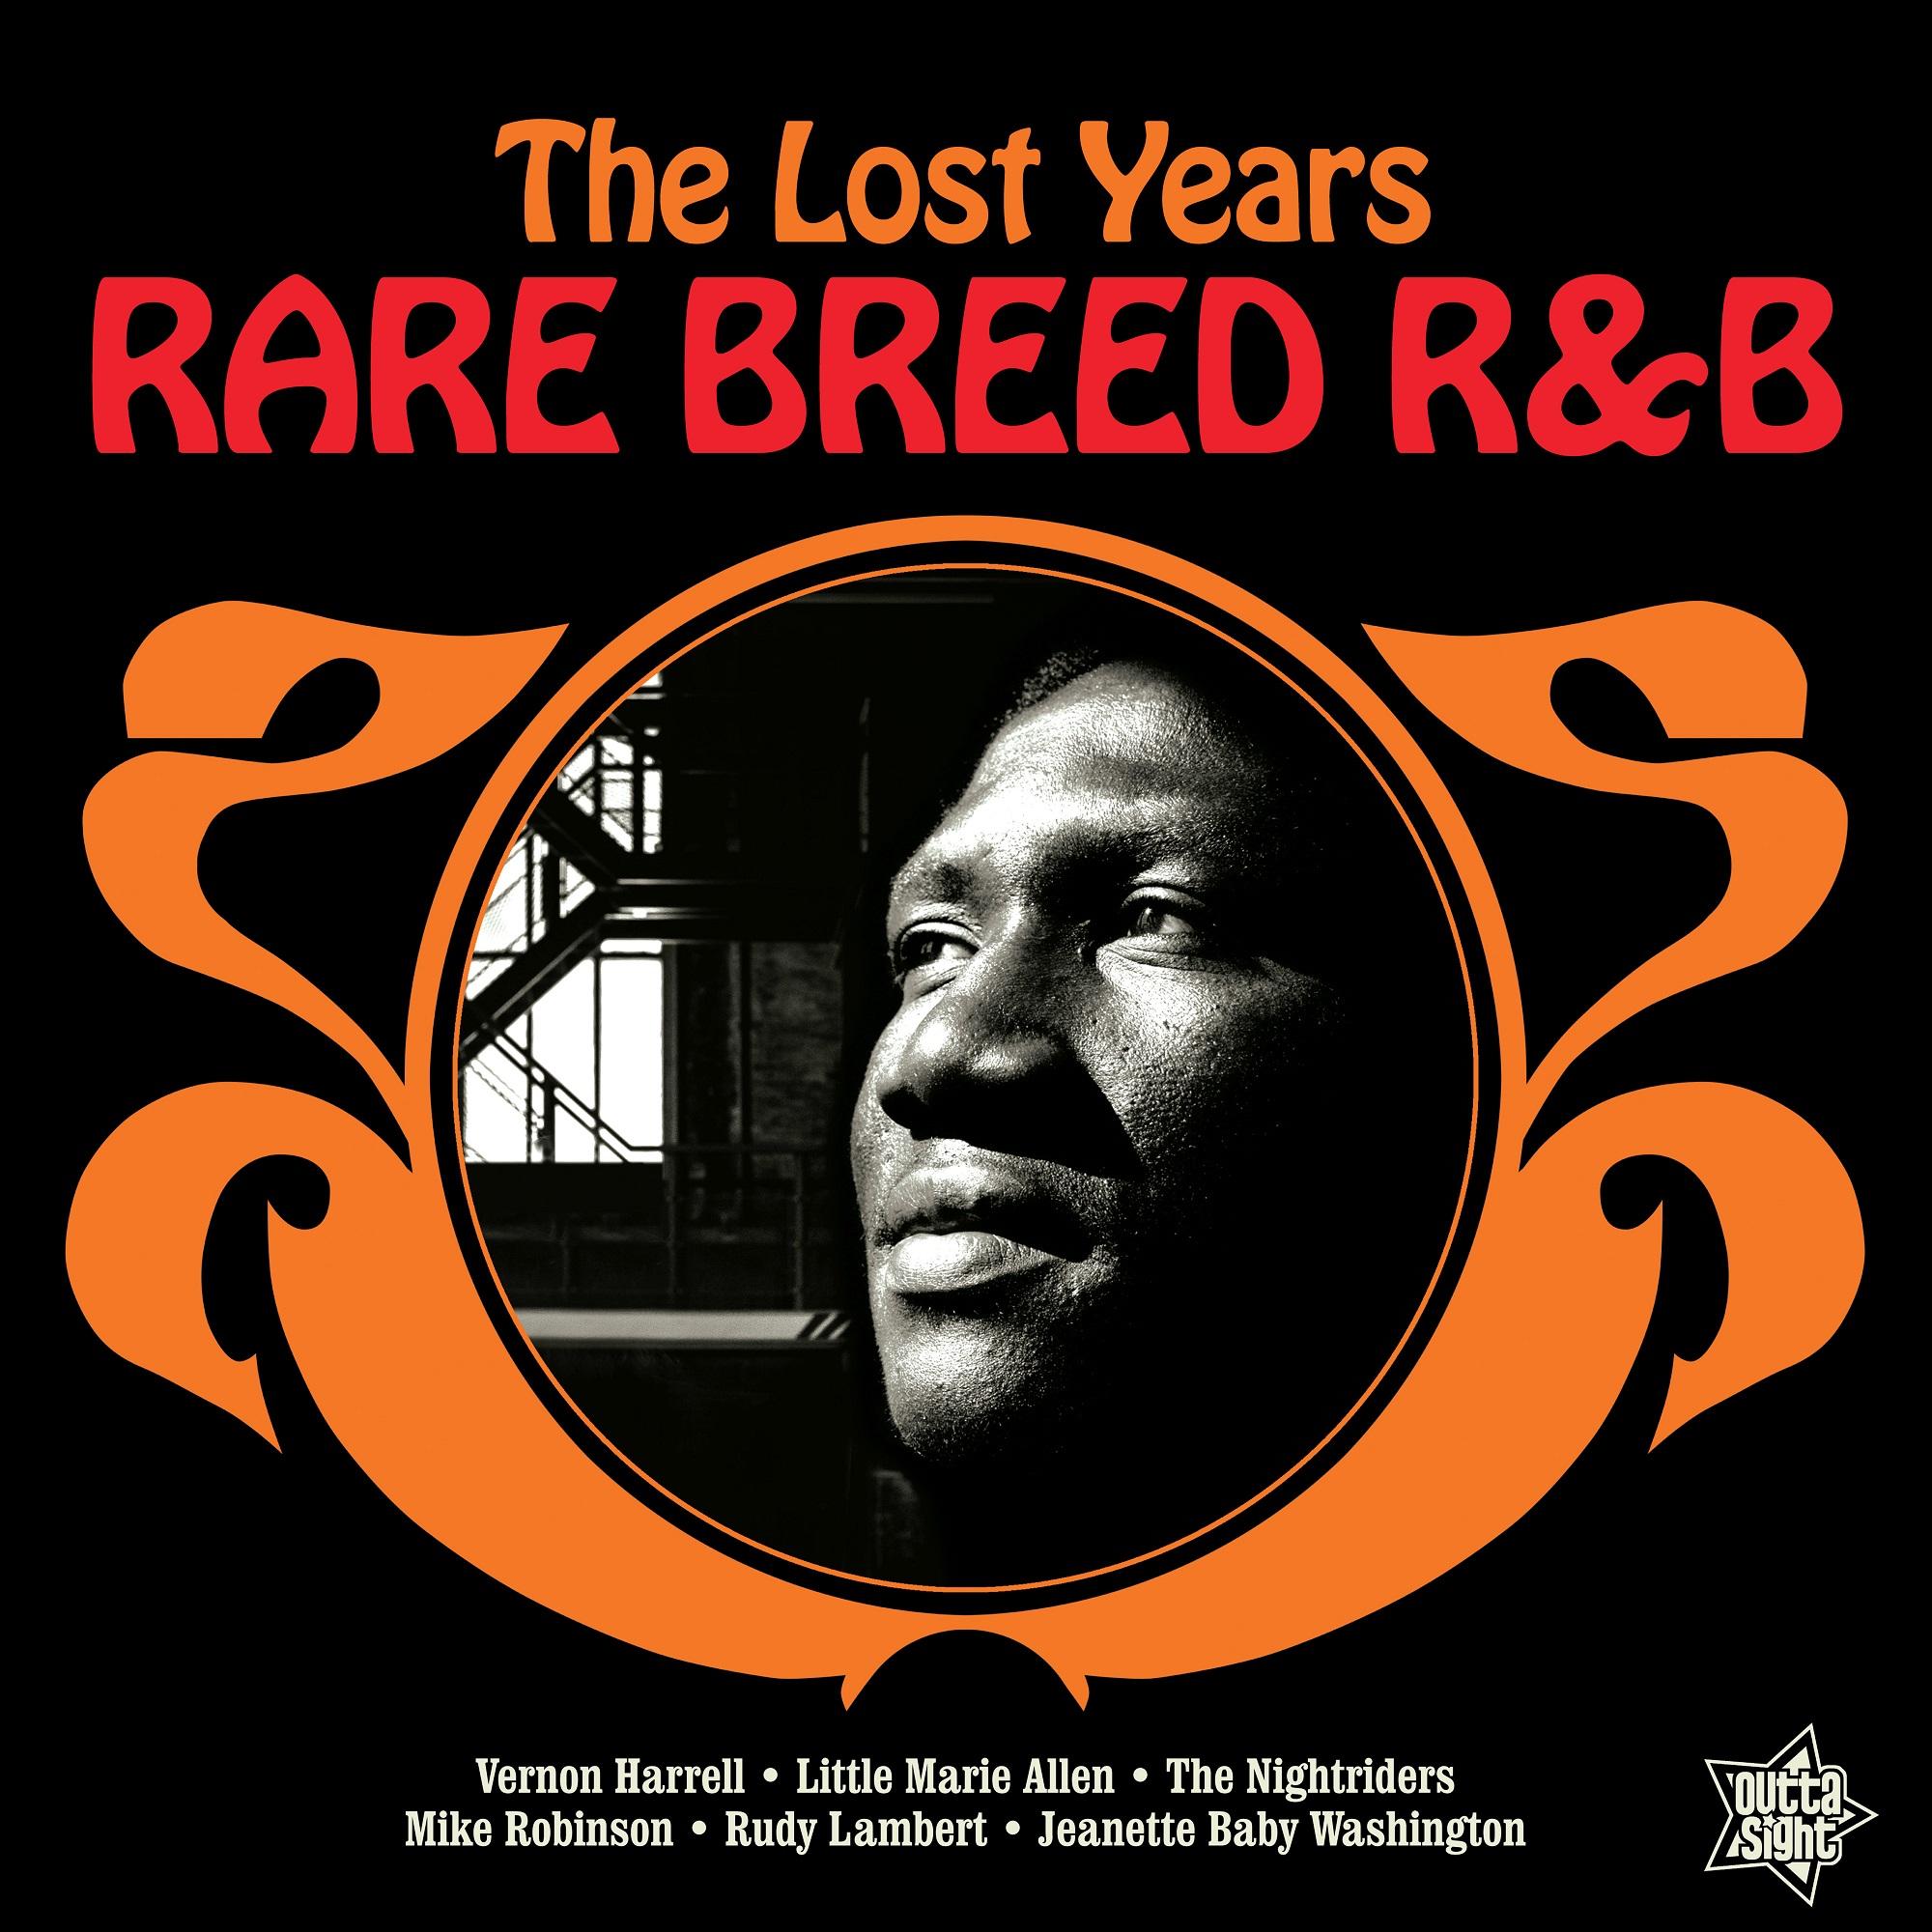 Northern Soul/RARE BREED R&B LP